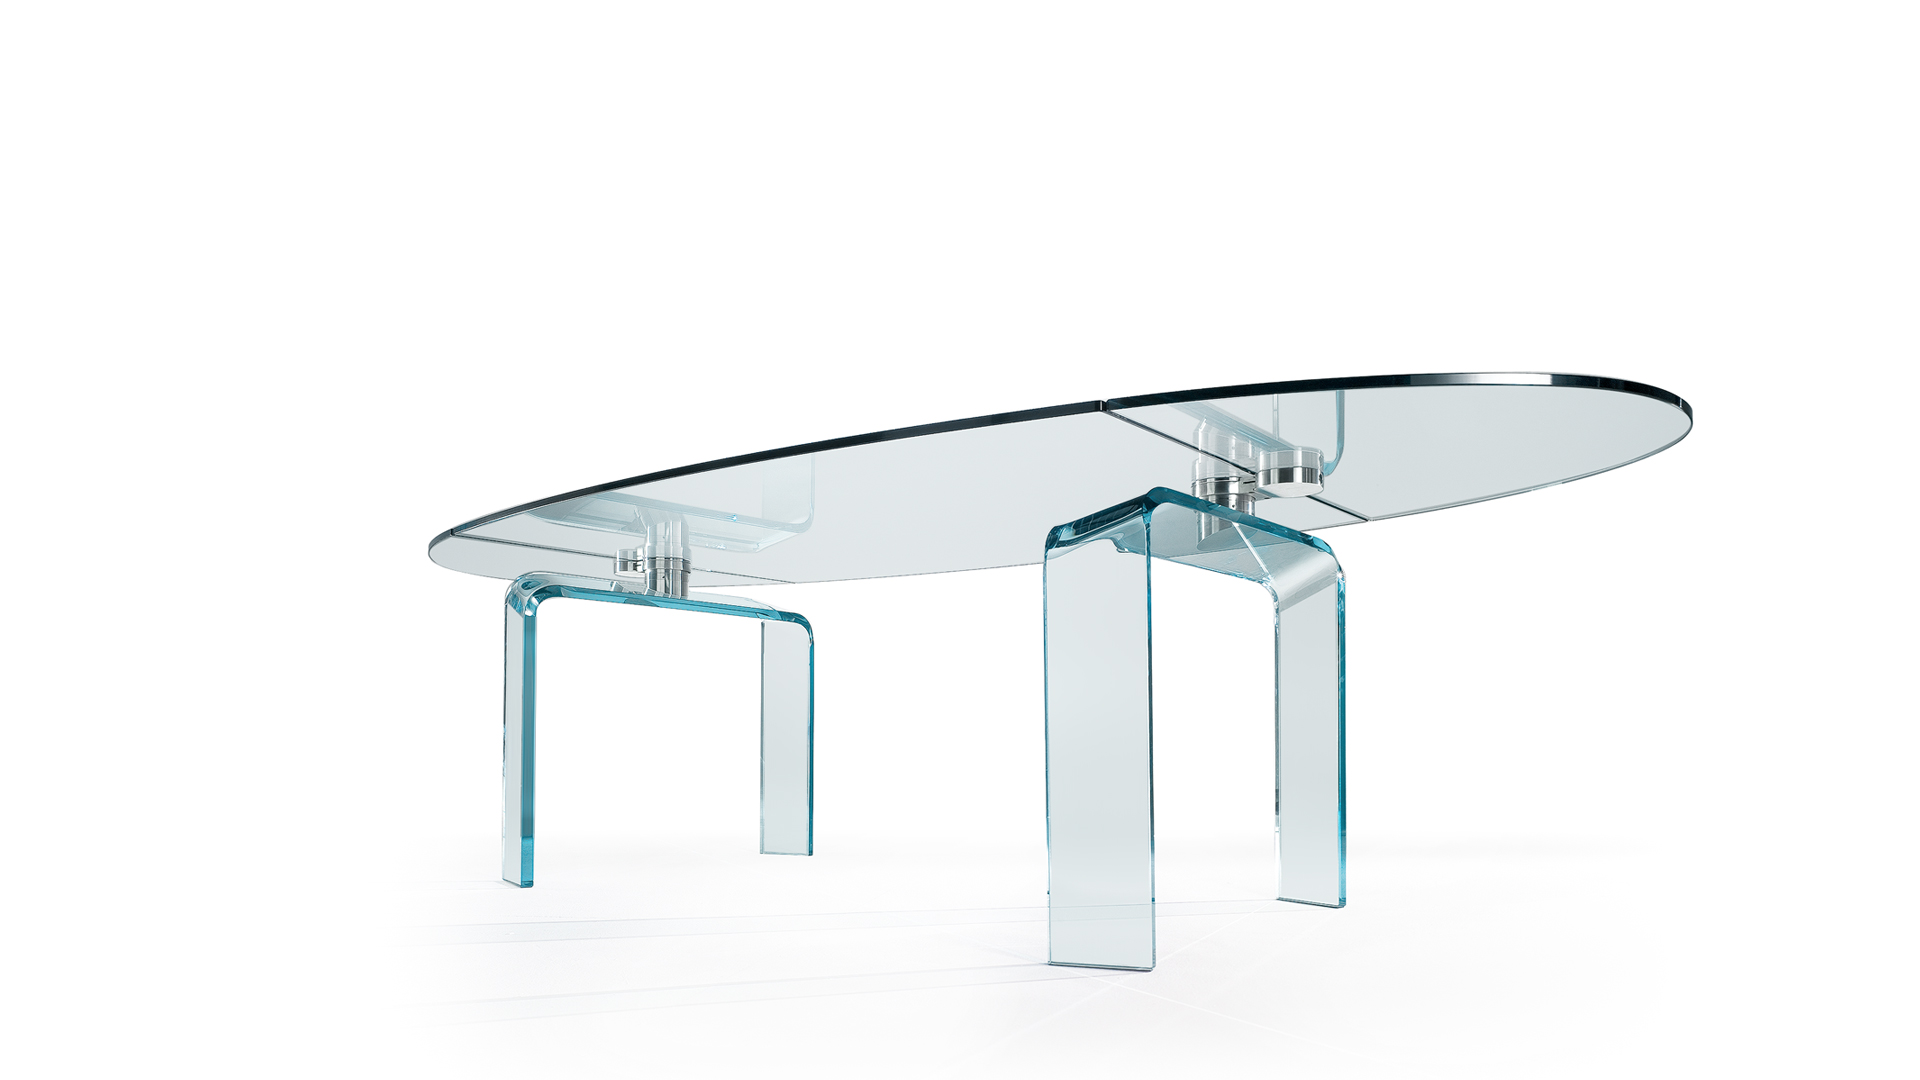 Tavolo policleto di reflex design arnaldo gamba leila guerra arredamento design - Tavolo pranzo cristallo ...